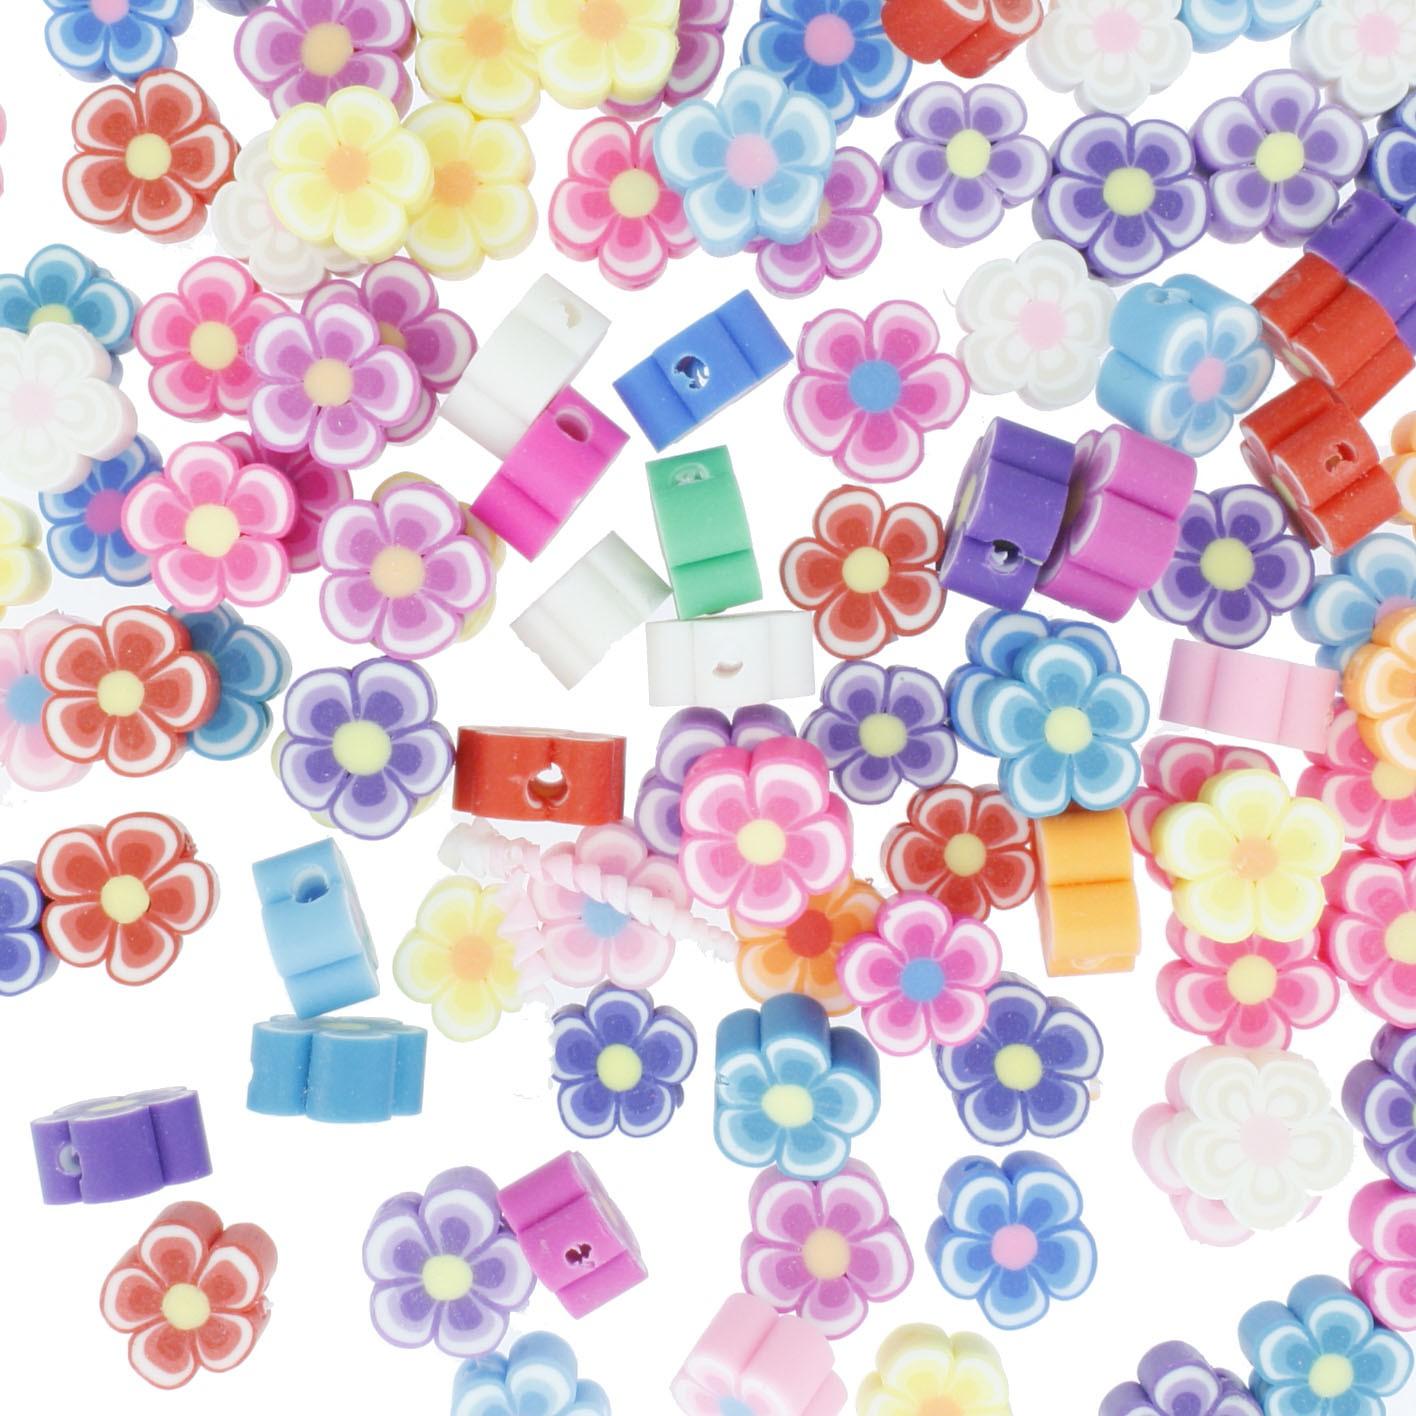 Miçanga Infantil - Borracha - Florzinha  - Stéphanie Bijoux® - Peças para Bijuterias e Artesanato